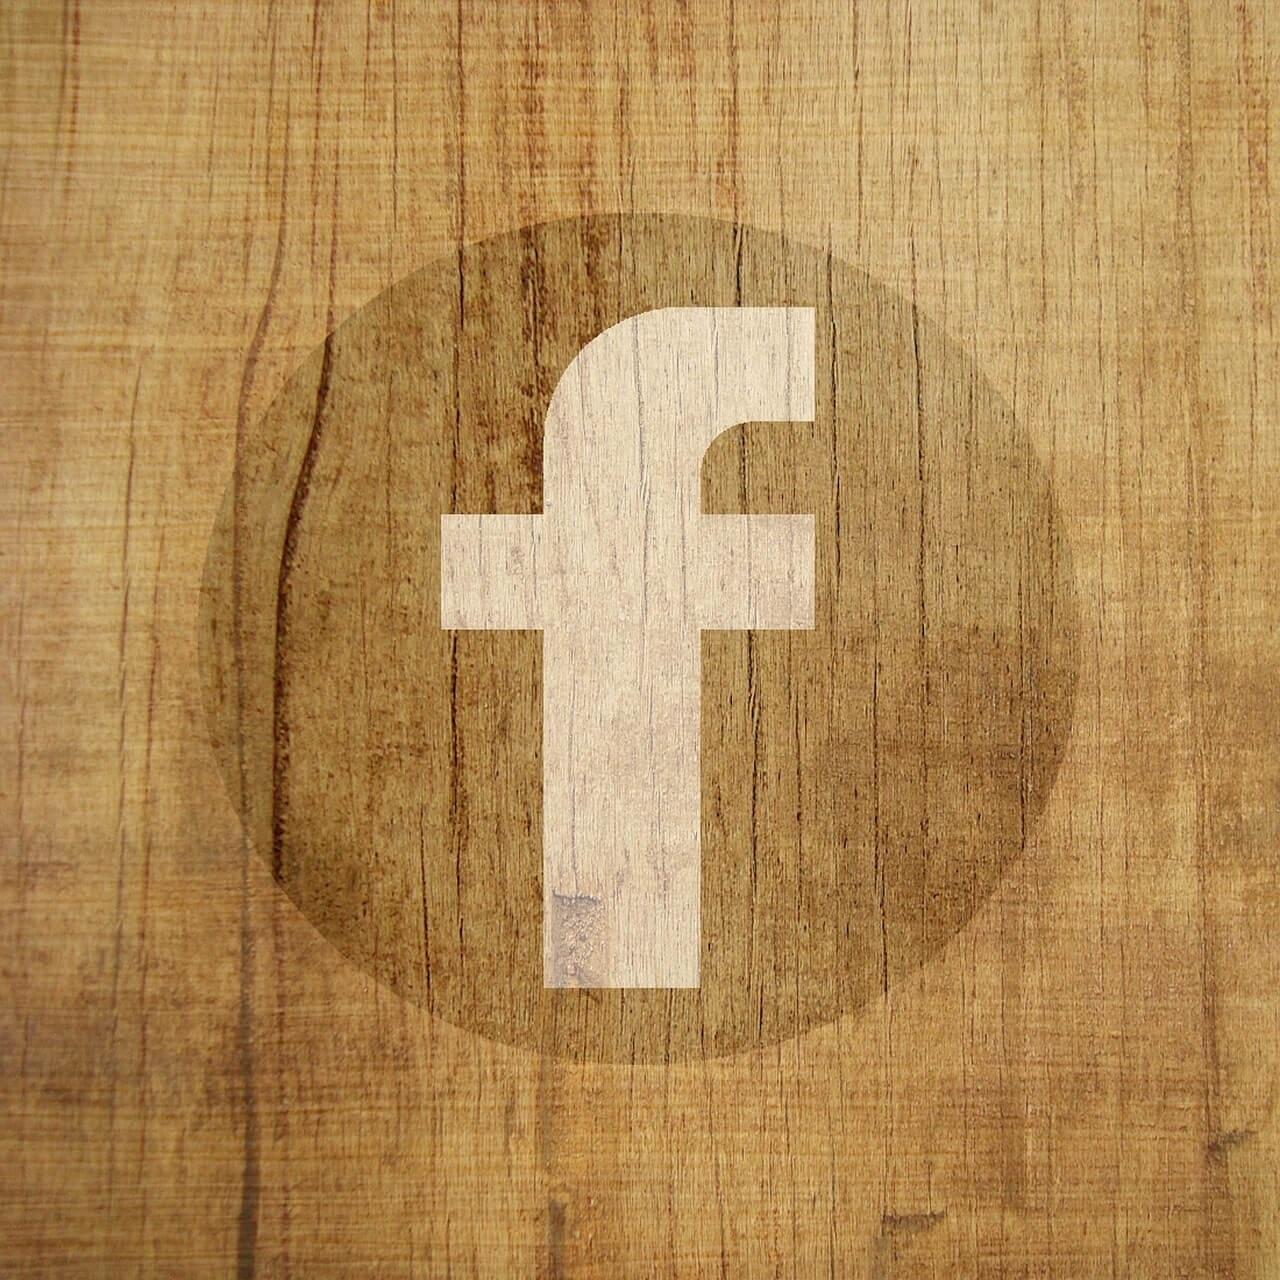 facebook-1811282_1280[1]